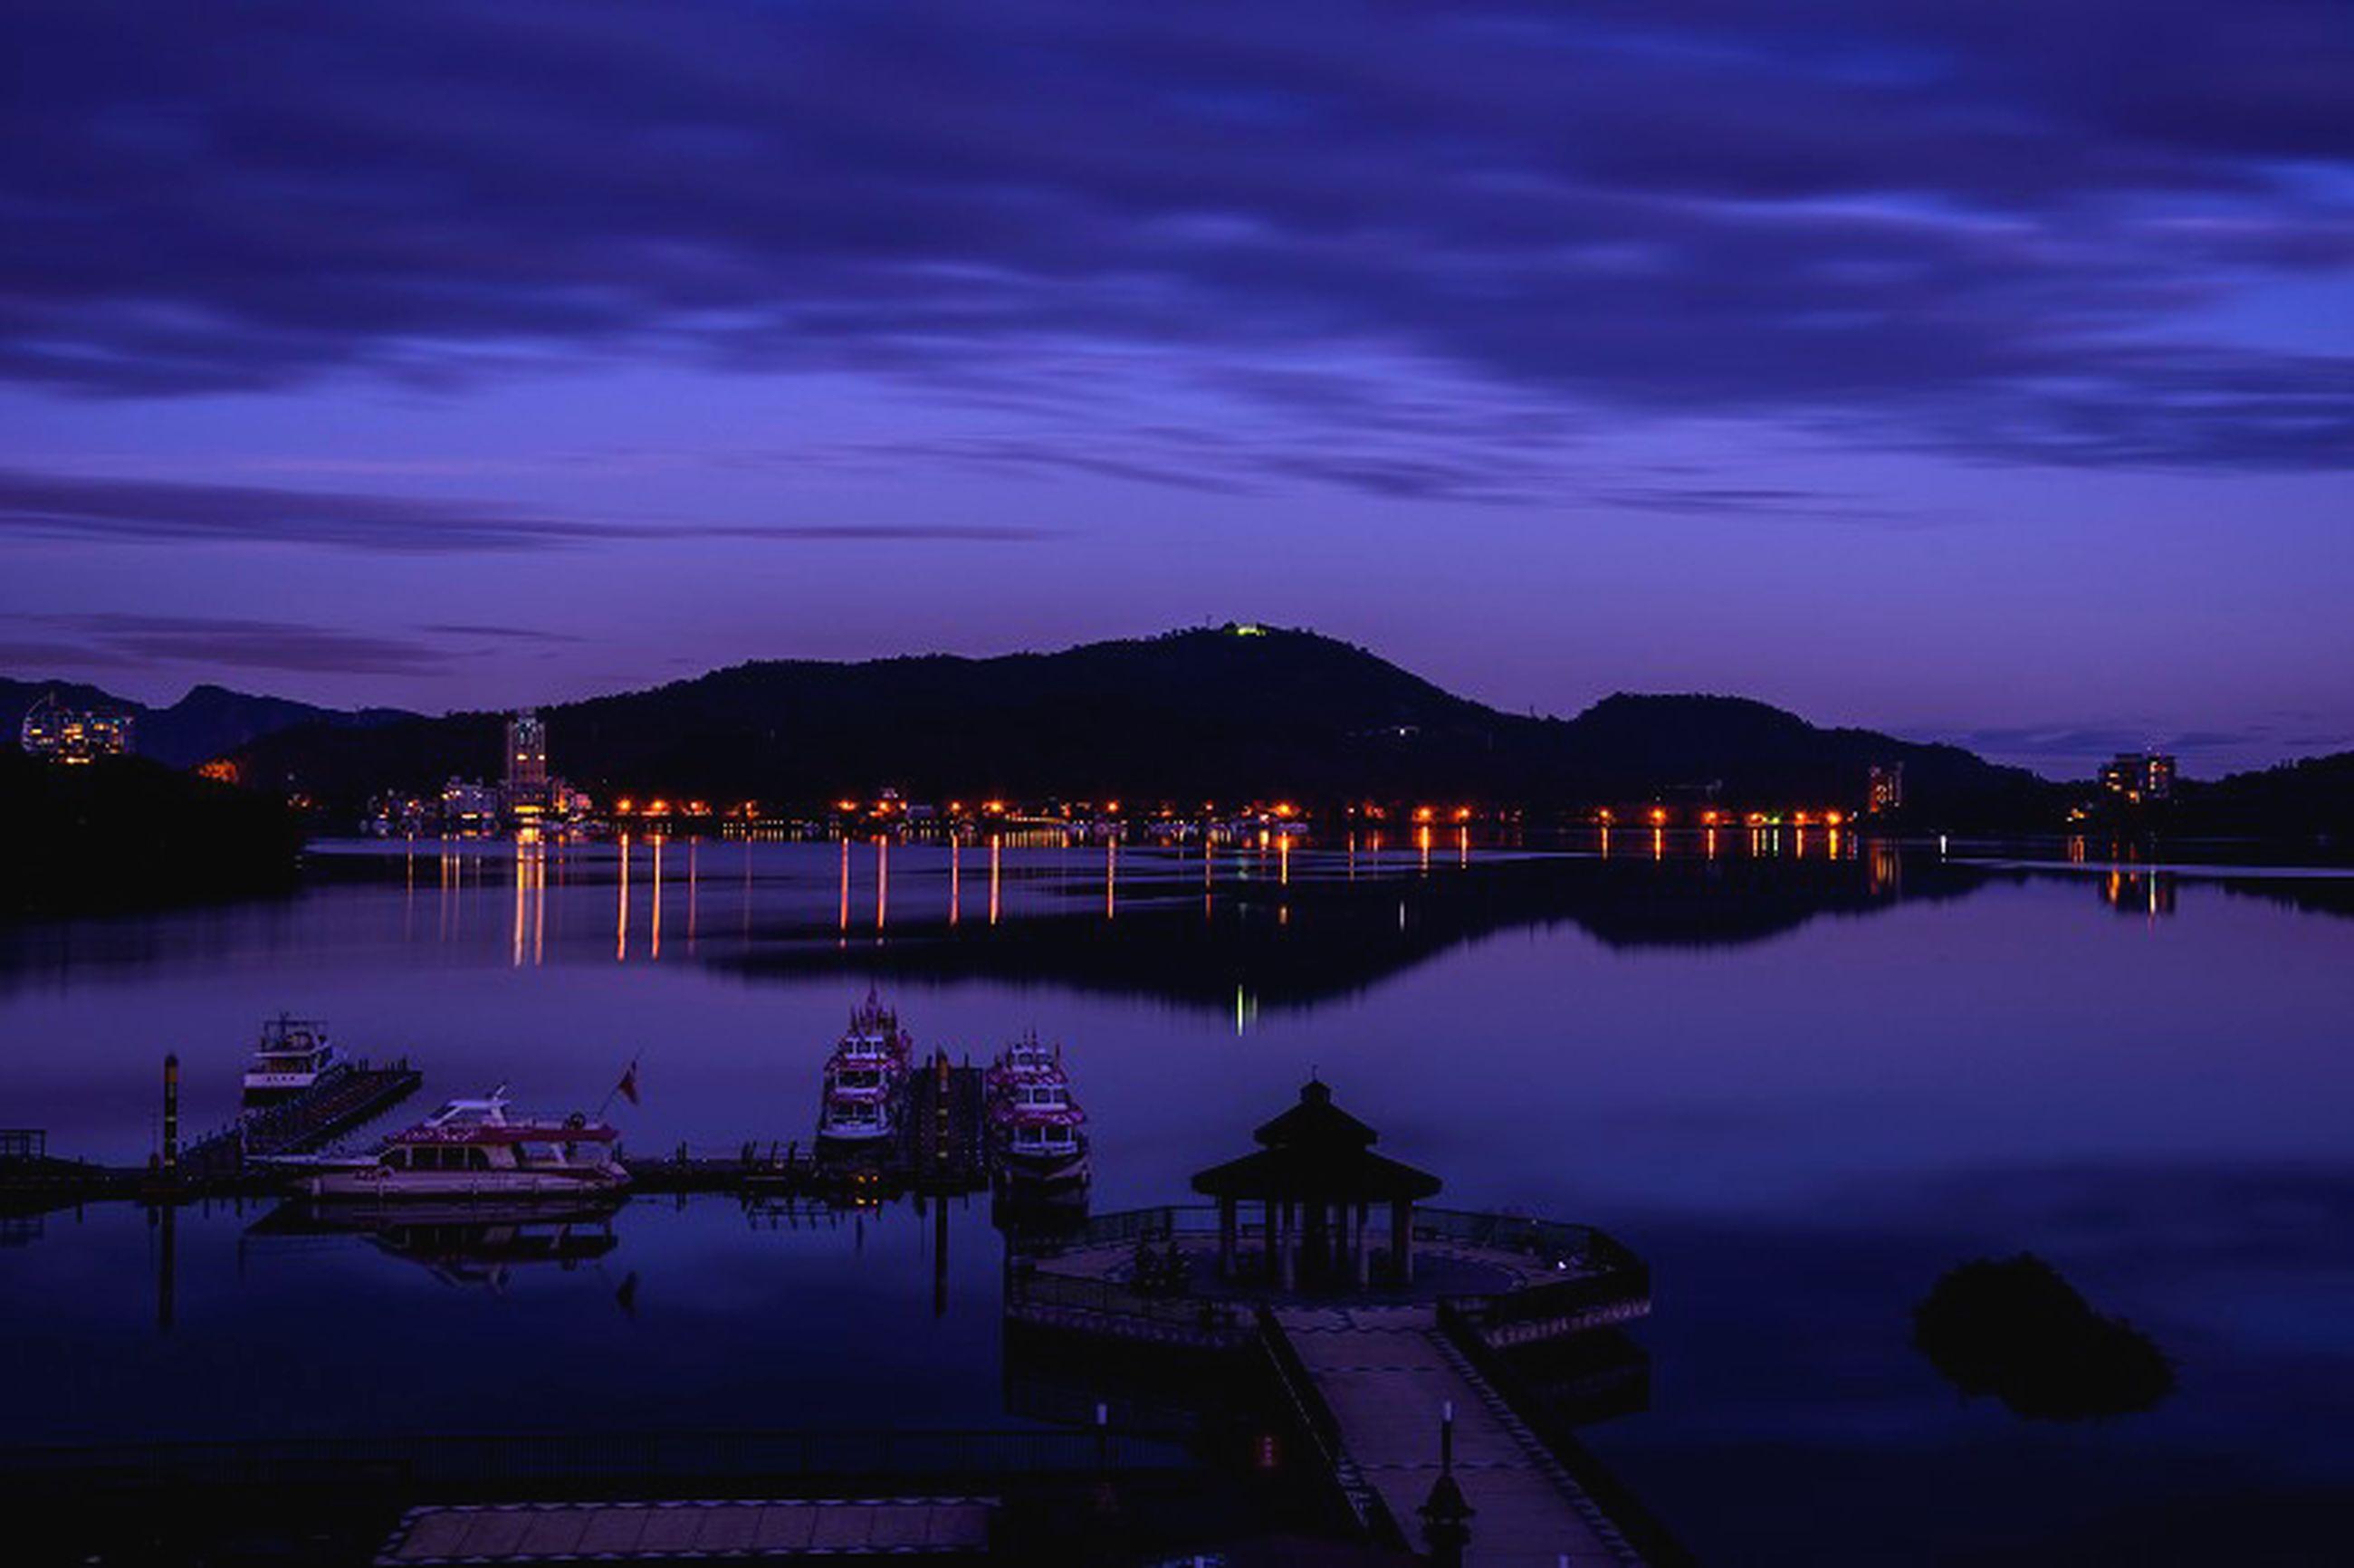 water, sky, reflection, illuminated, nautical vessel, cloud - sky, lake, mountain, moored, dusk, boat, tranquil scene, scenics, sunset, tranquility, waterfront, transportation, sea, cloud, night